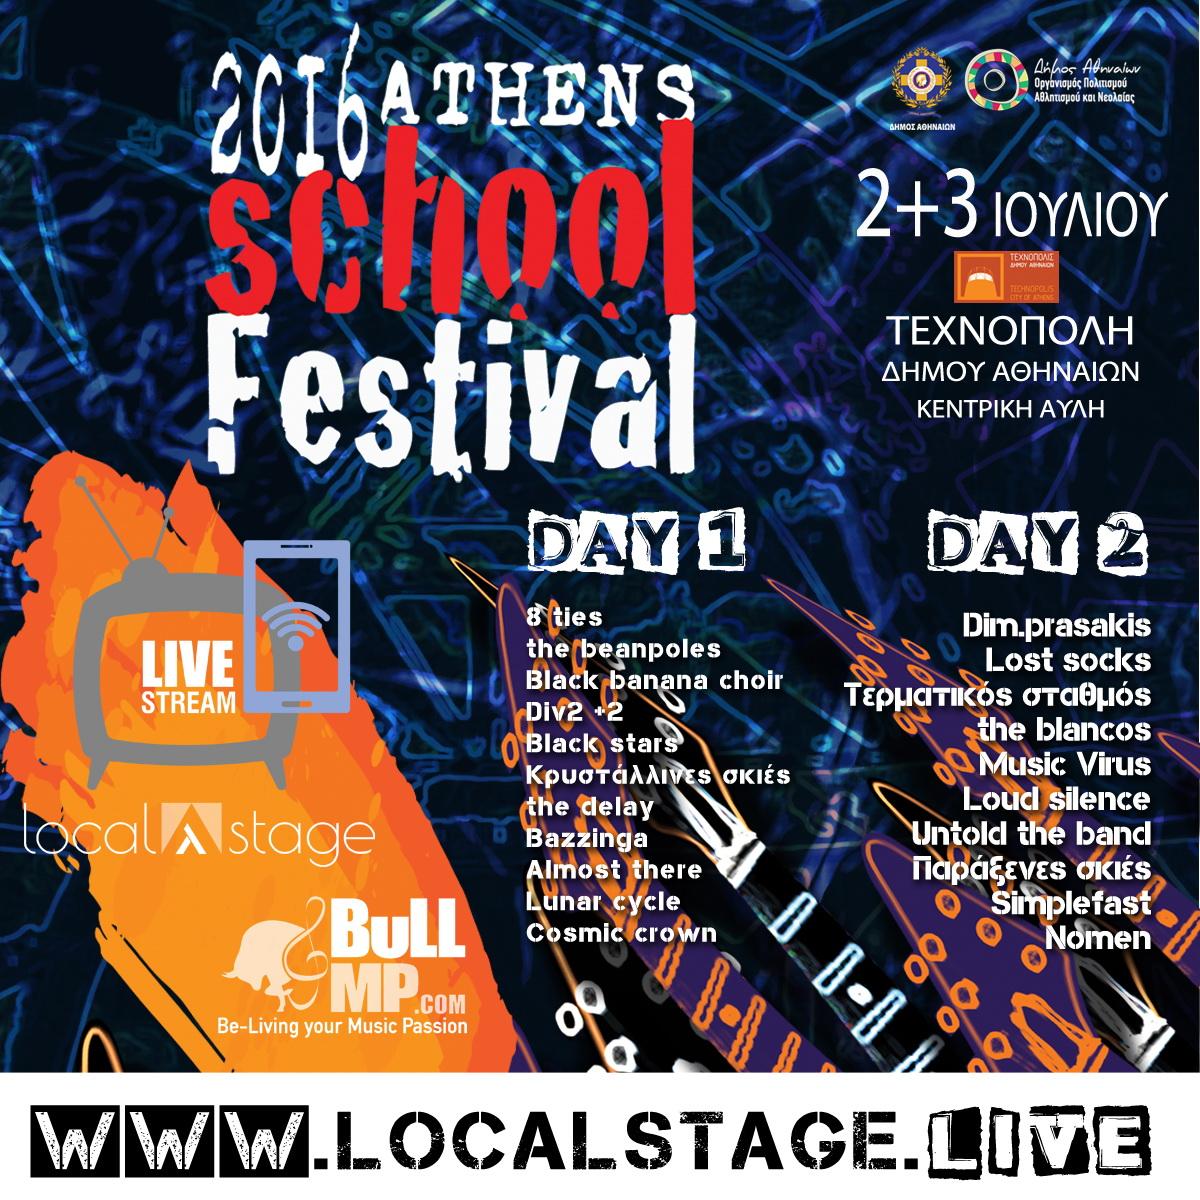 Athens School Festival